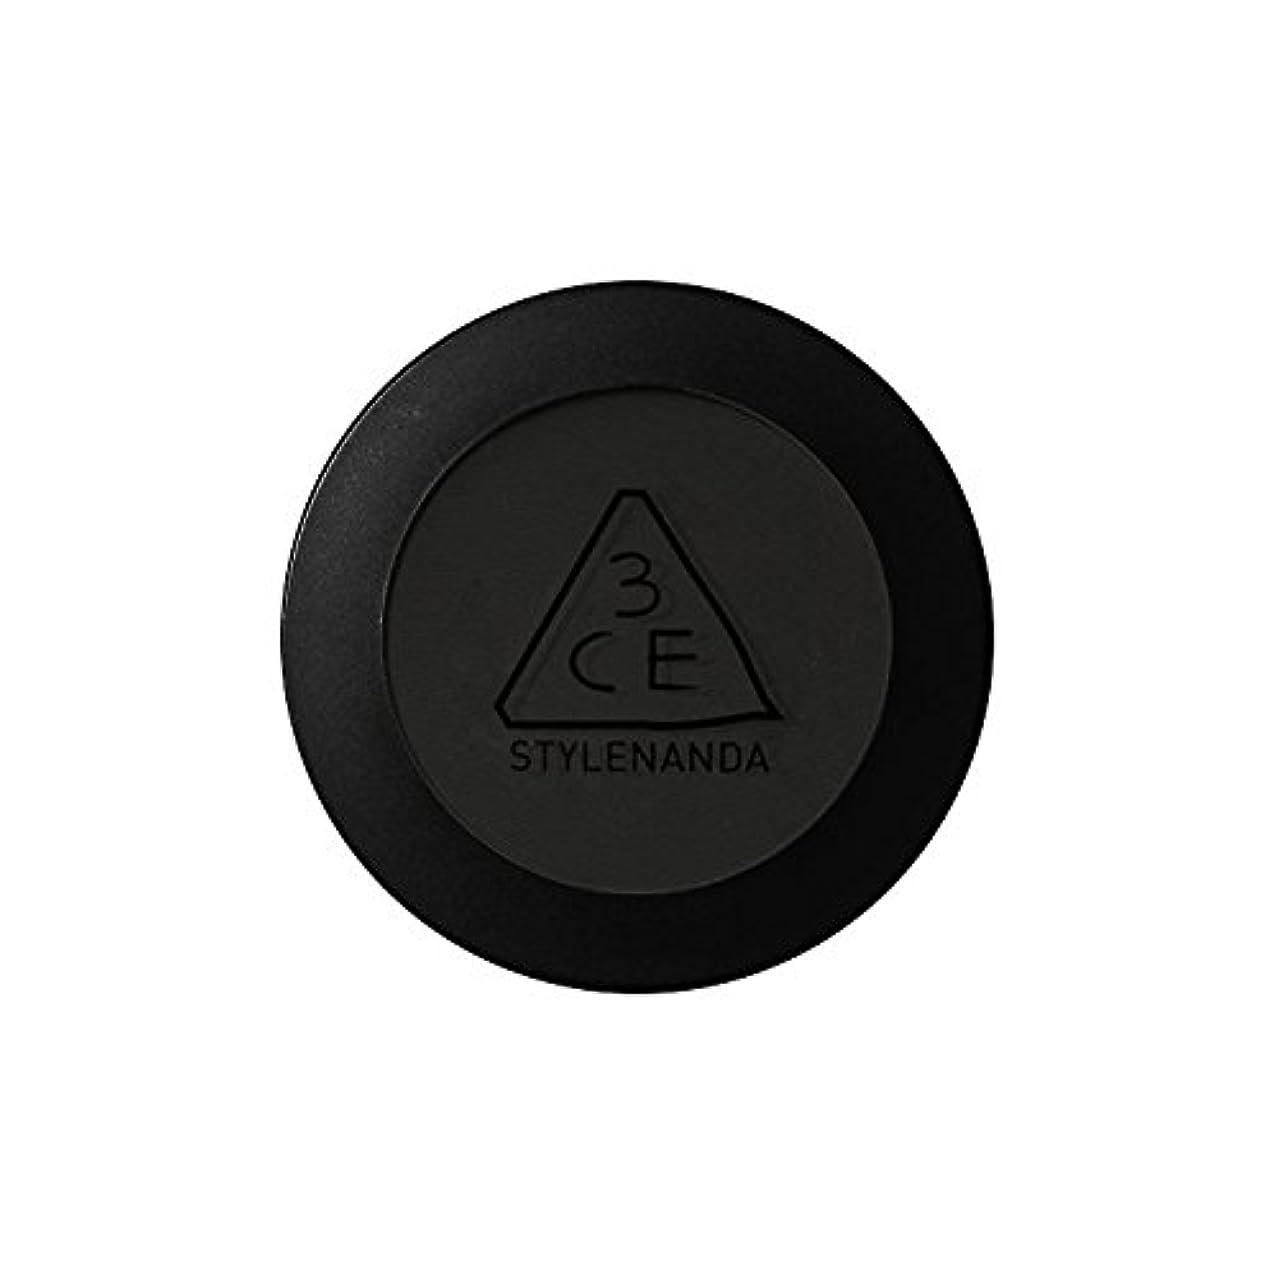 3CE ONE COLOR SHADOW(Matt) #BLACK JACK / 3CE ワンカラーシャドウ(マット)2.5g [並行輸入品]